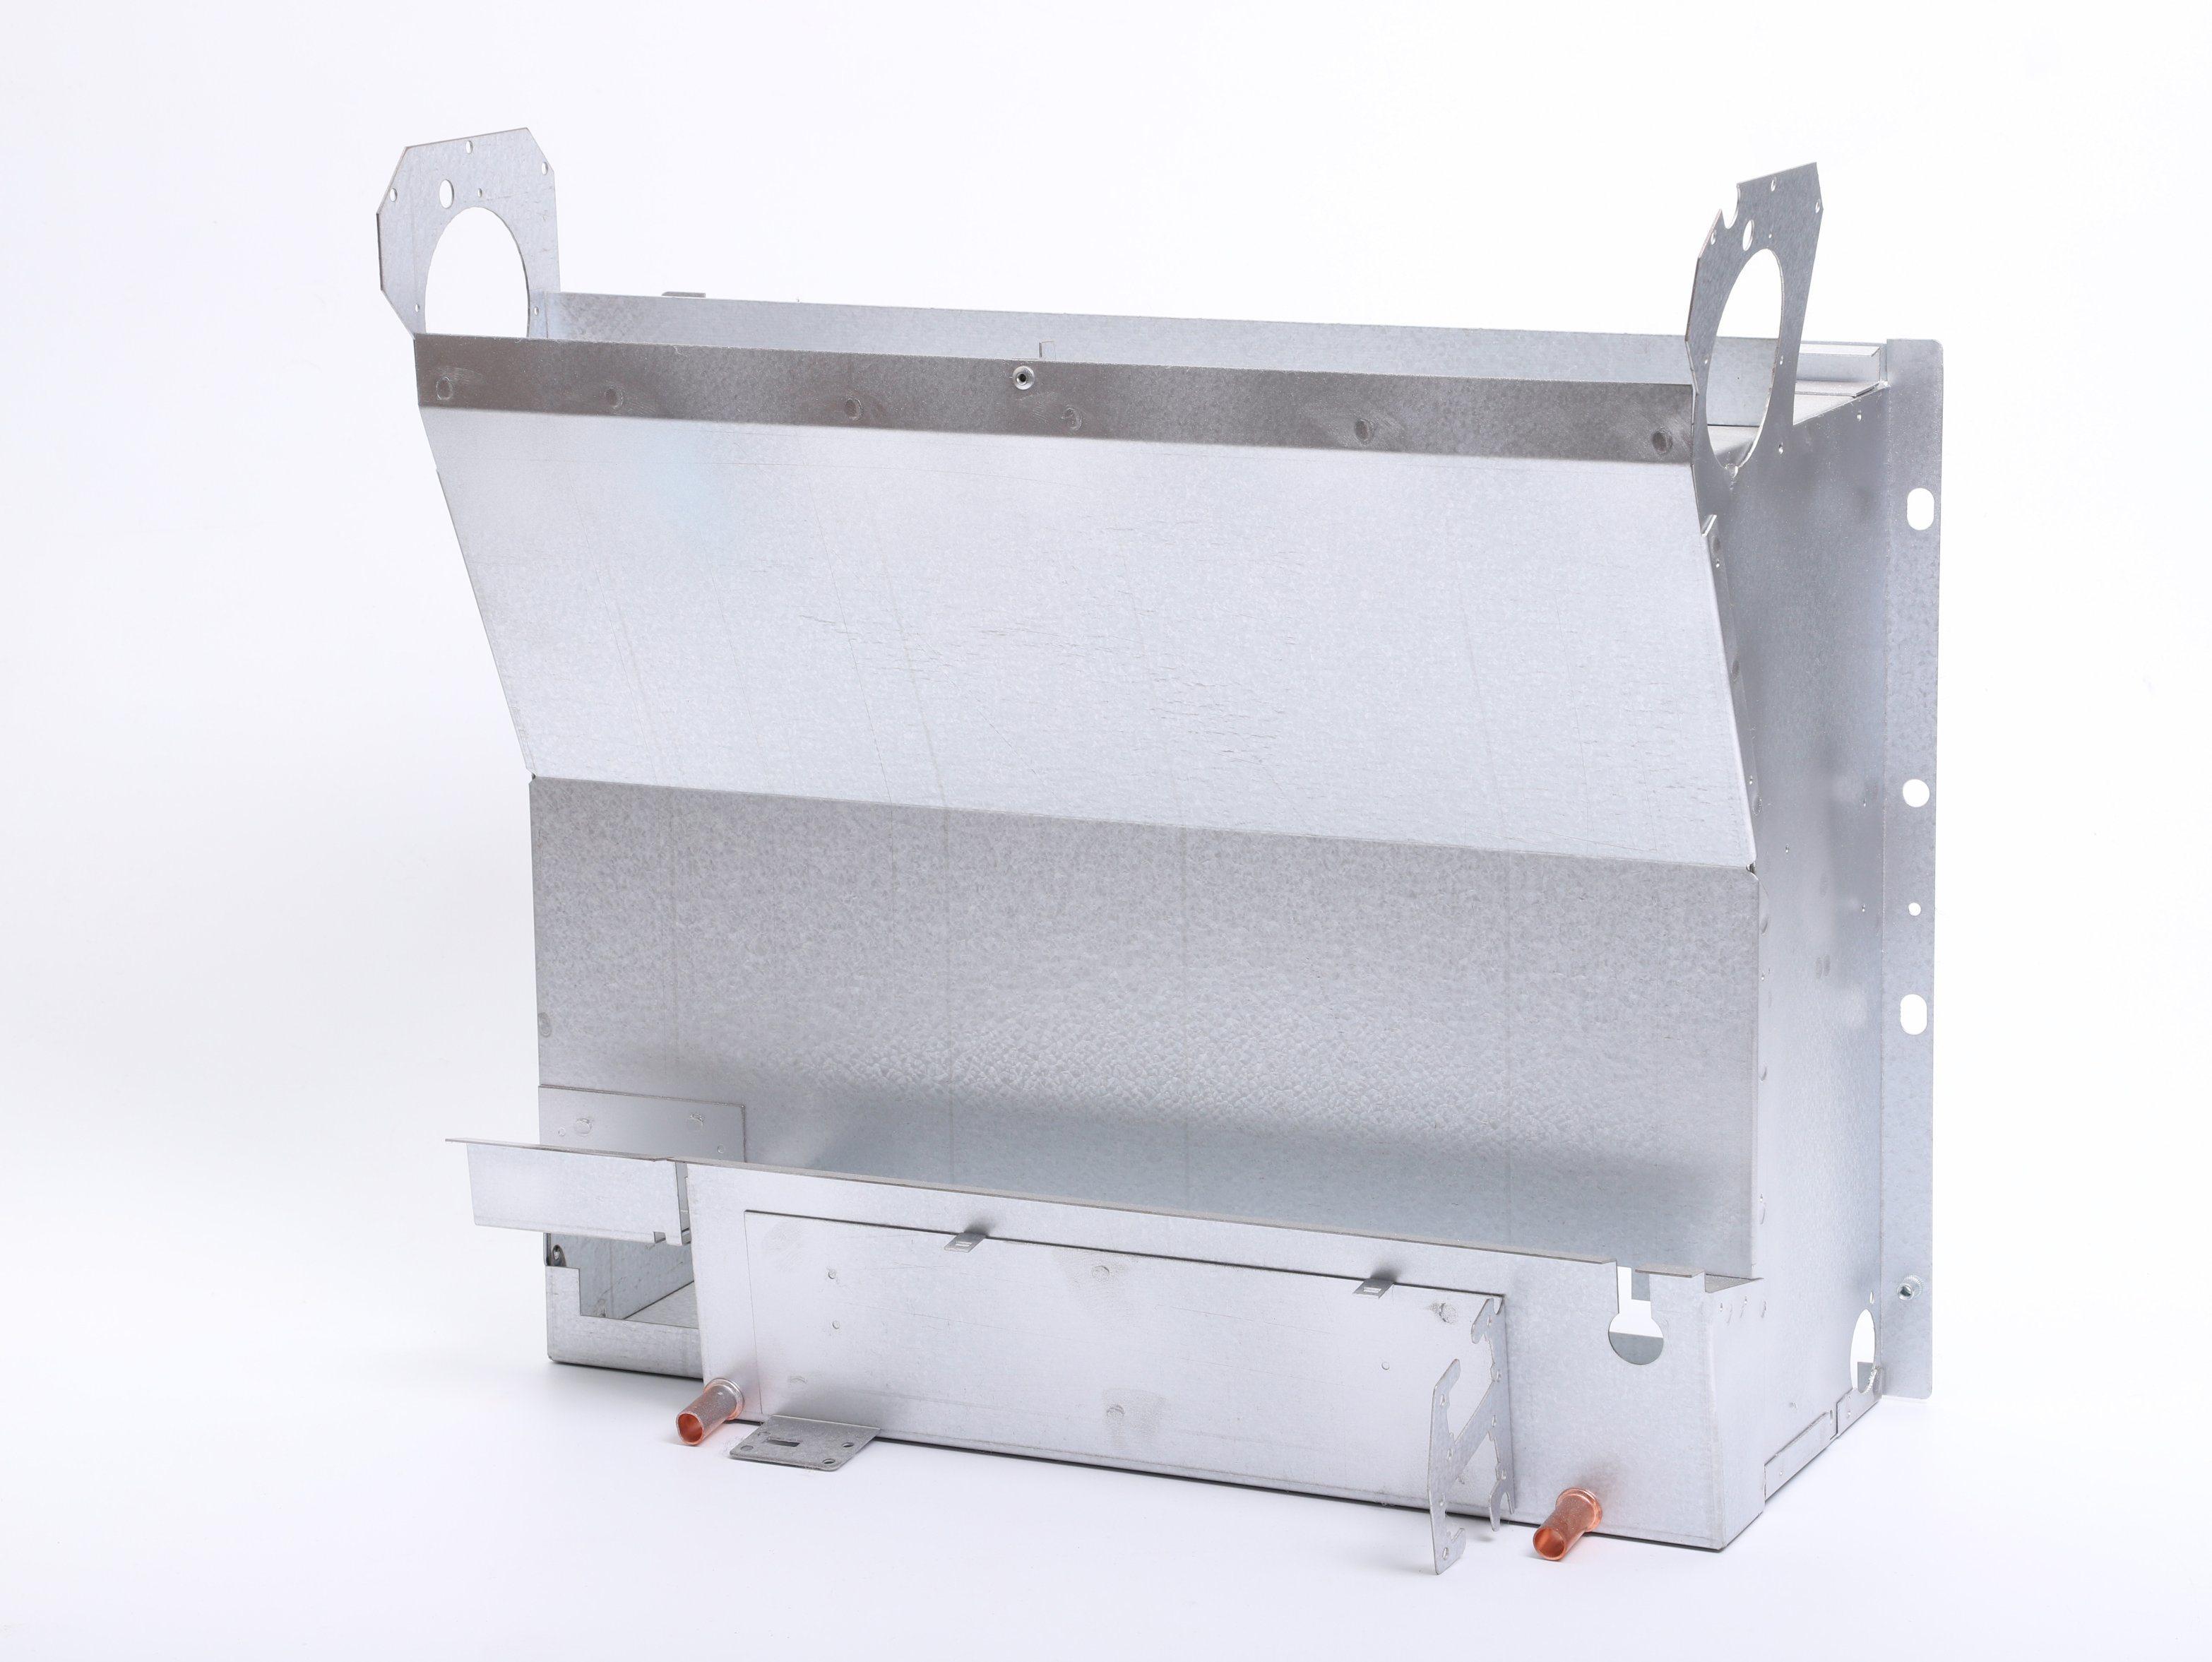 Custom Sheet Metal Bending Tools Used for Sewing Machine Parts